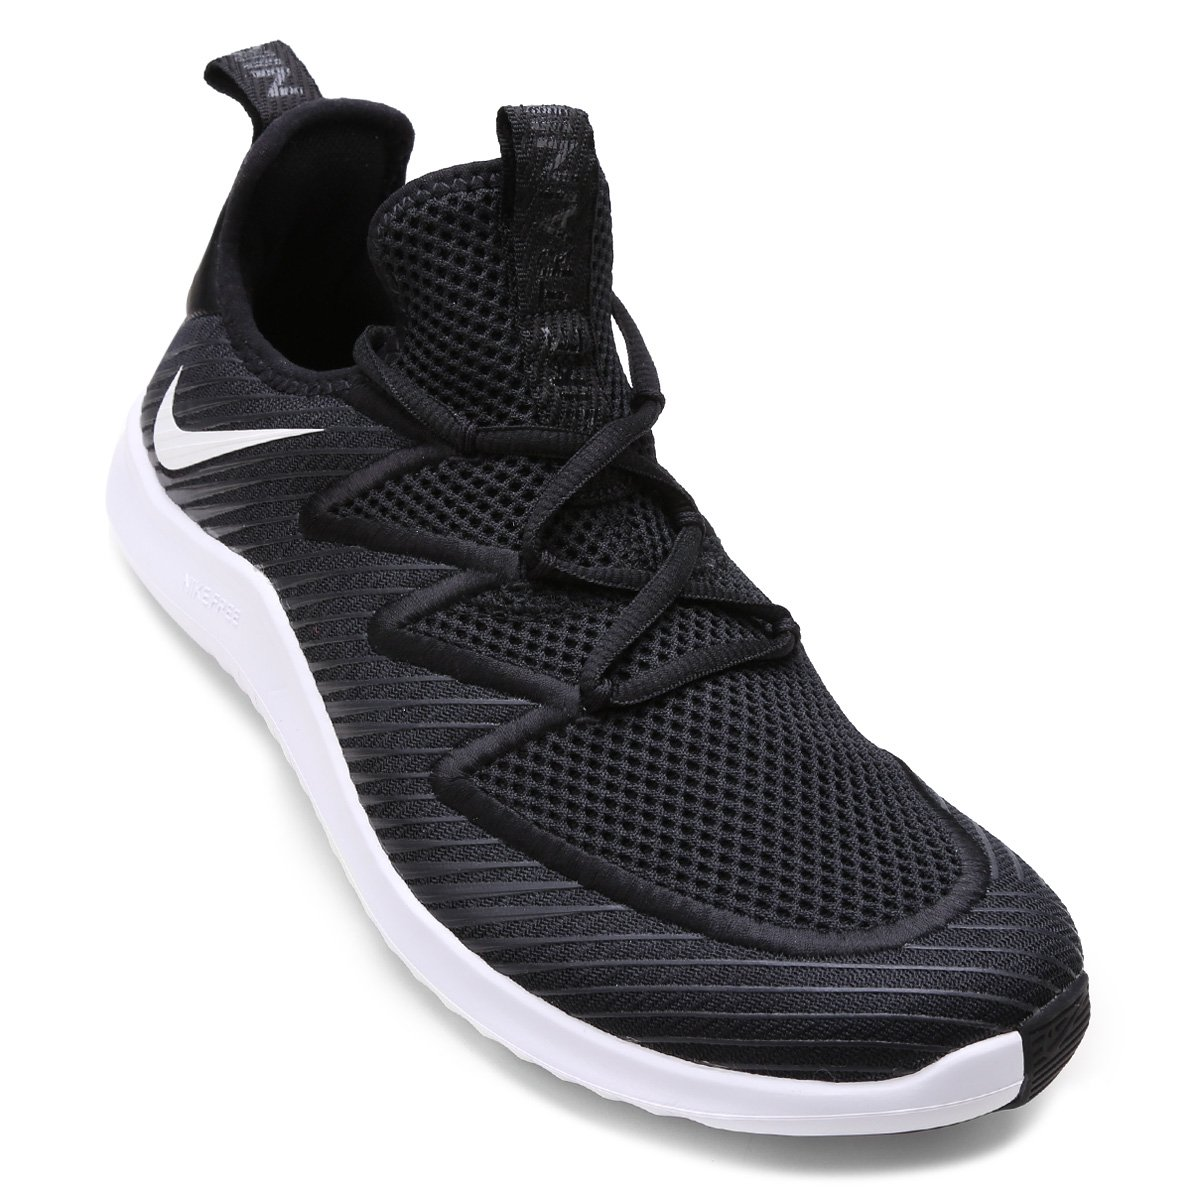 892c124a205 Tênis Nike Free Tr Ultra Masculino - Preto e Branco - Compre Agora ...